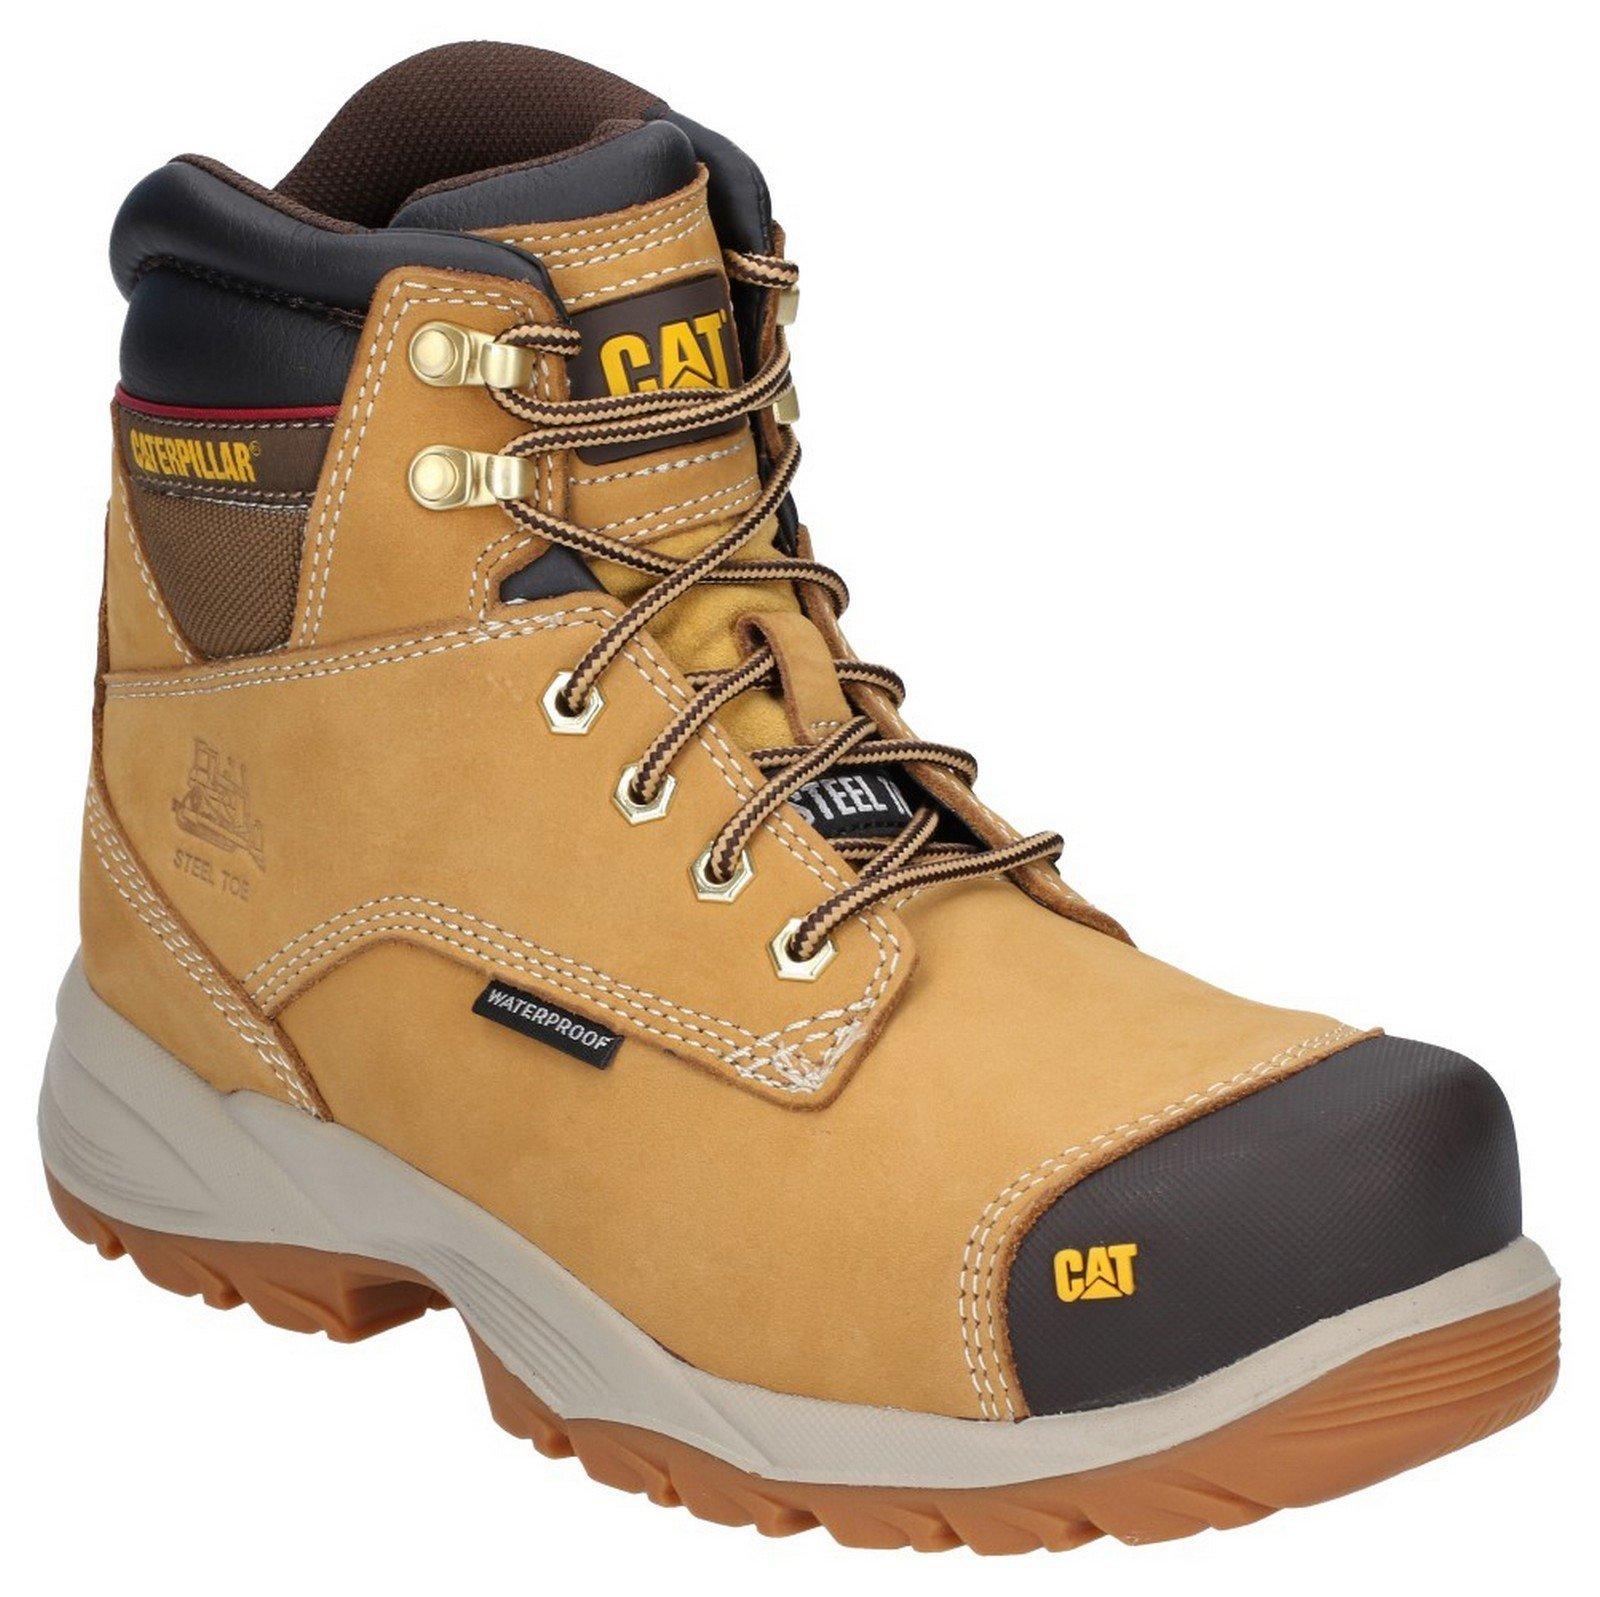 Caterpillar Men's Spiro Lace Up Waterproof Safety Boot Honey 29662 - Honey Reset 6